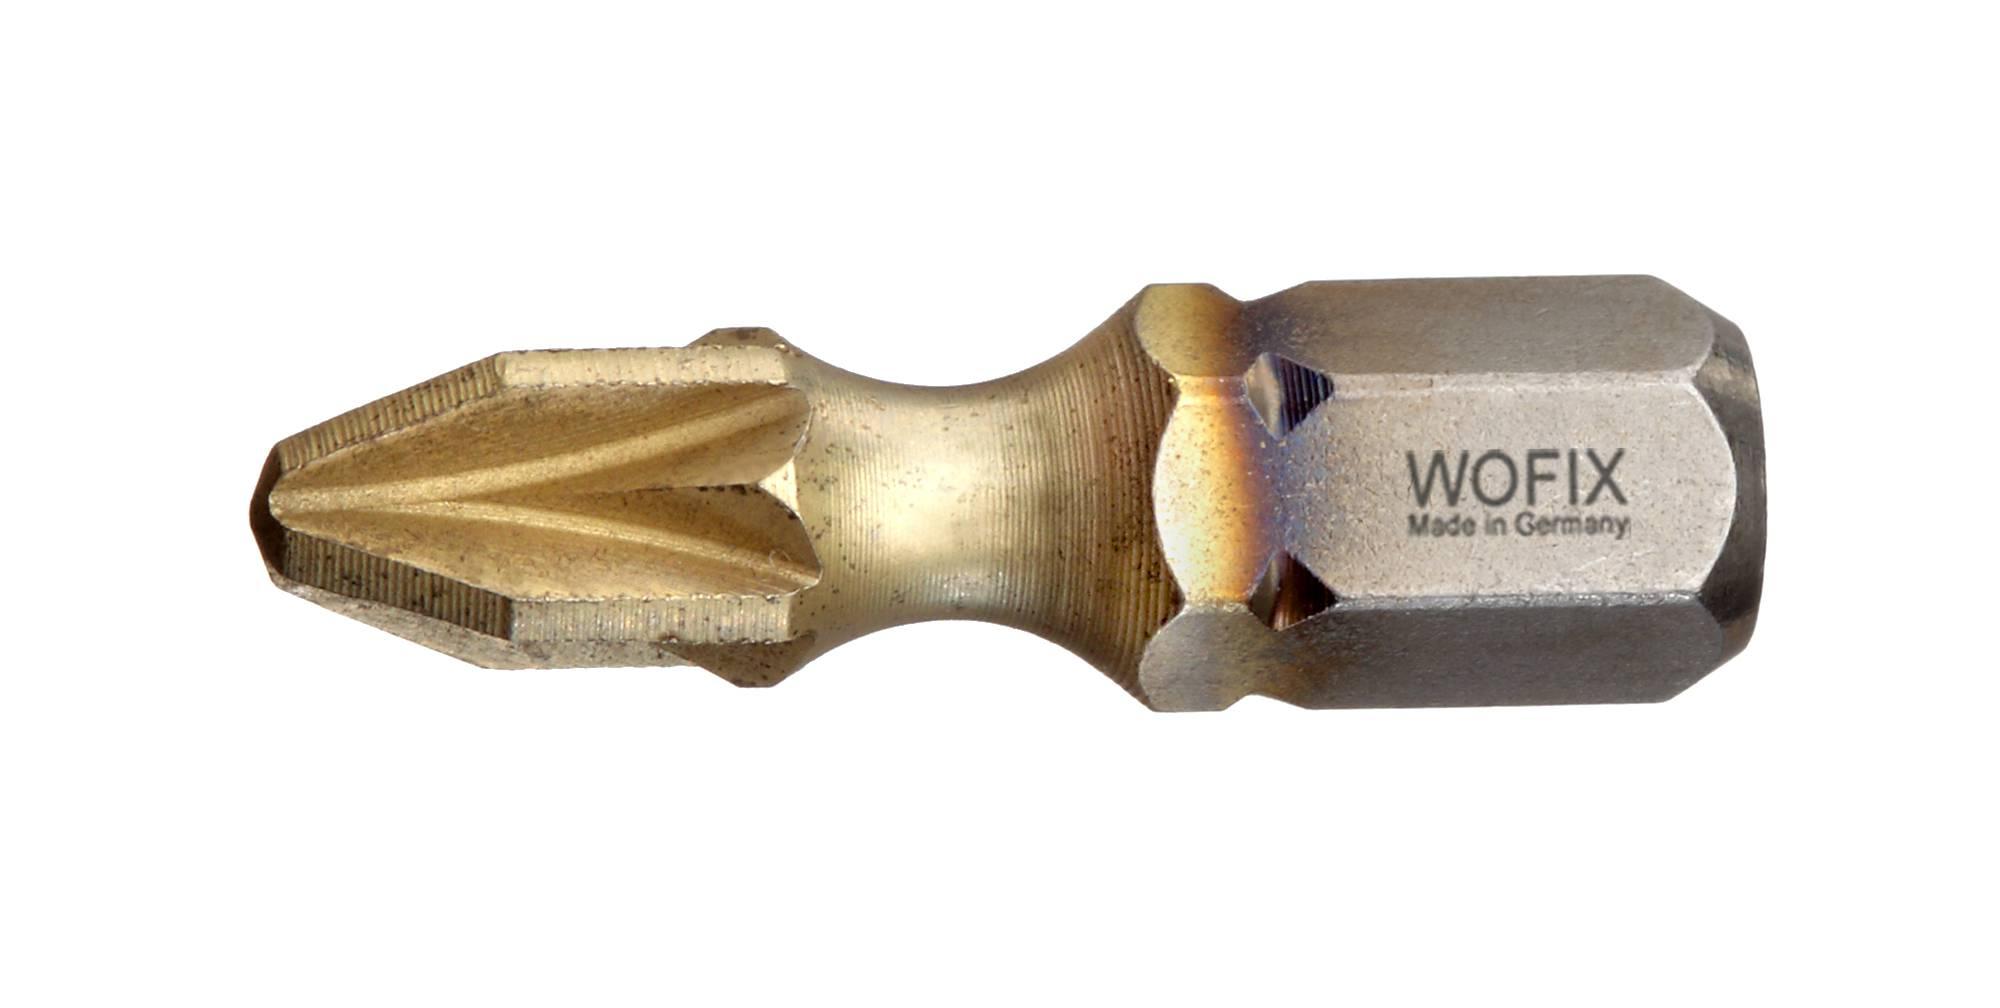 Wofix 7336125 Titanium Zirconium Pozidrive bit - PZ1 x 25 mm